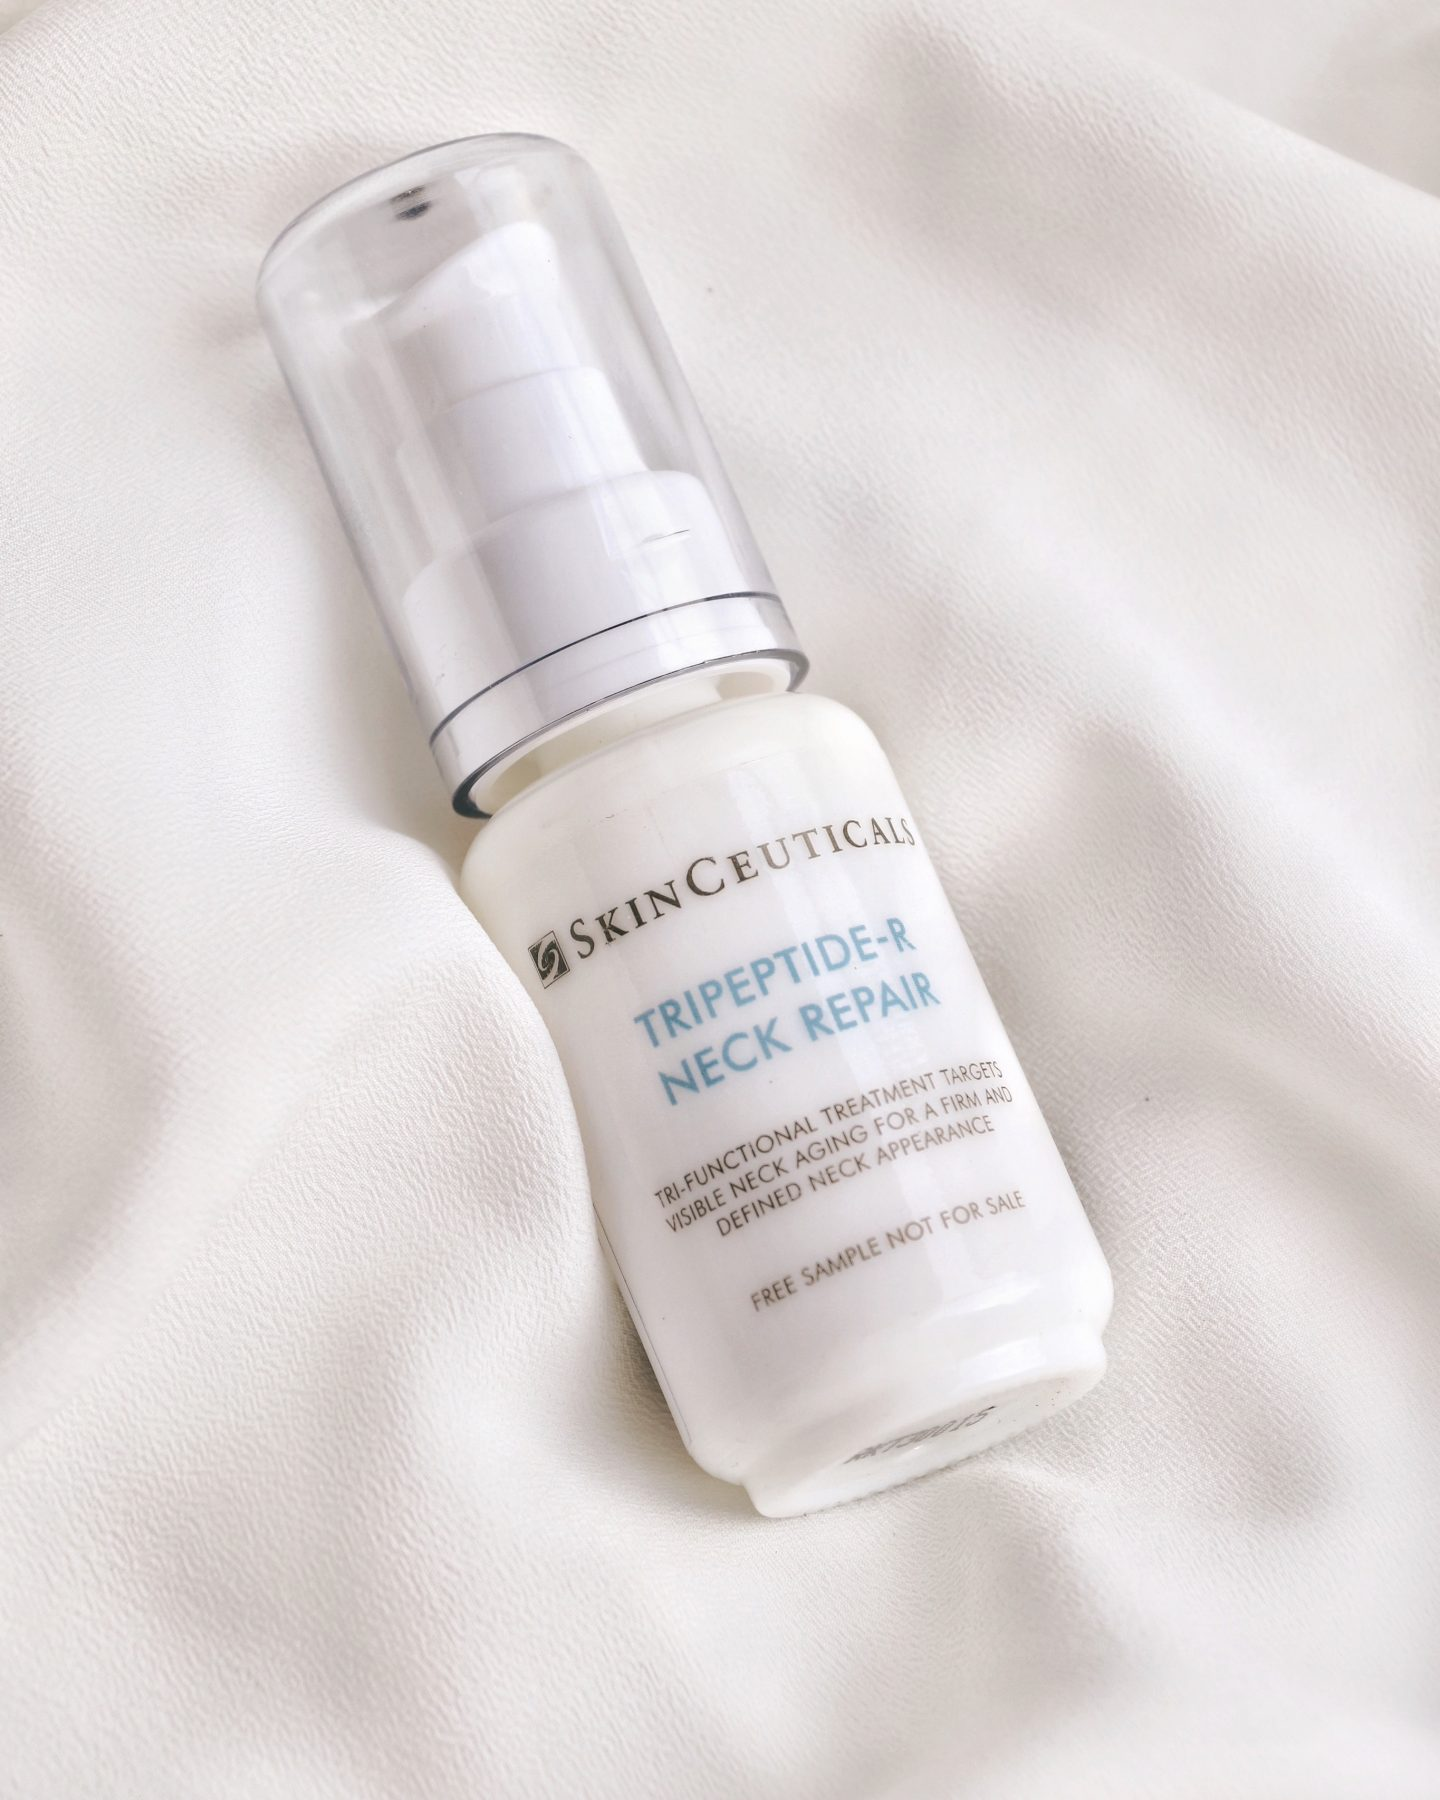 SkinCeuticals Tripeptide-R Neck Repair